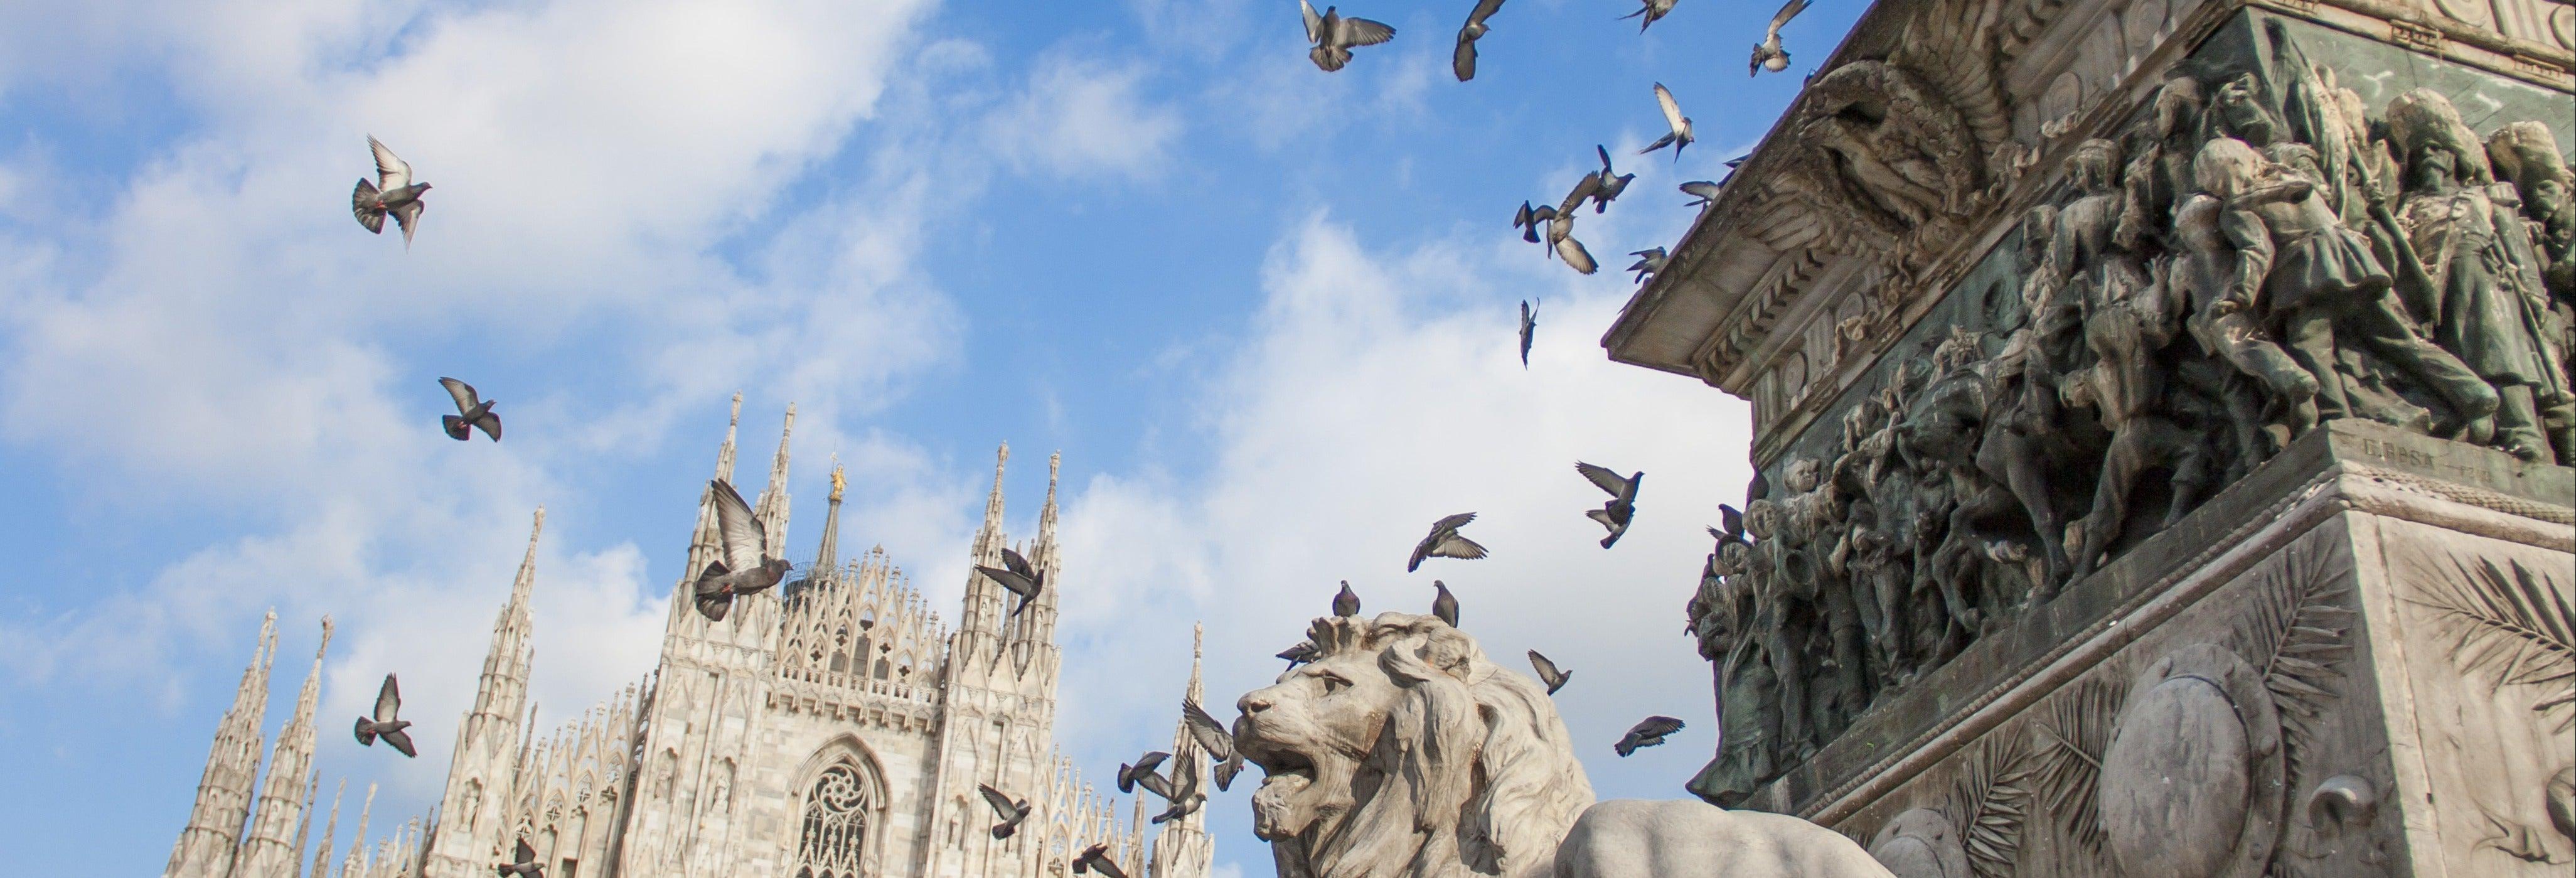 Milan by High Speed Train